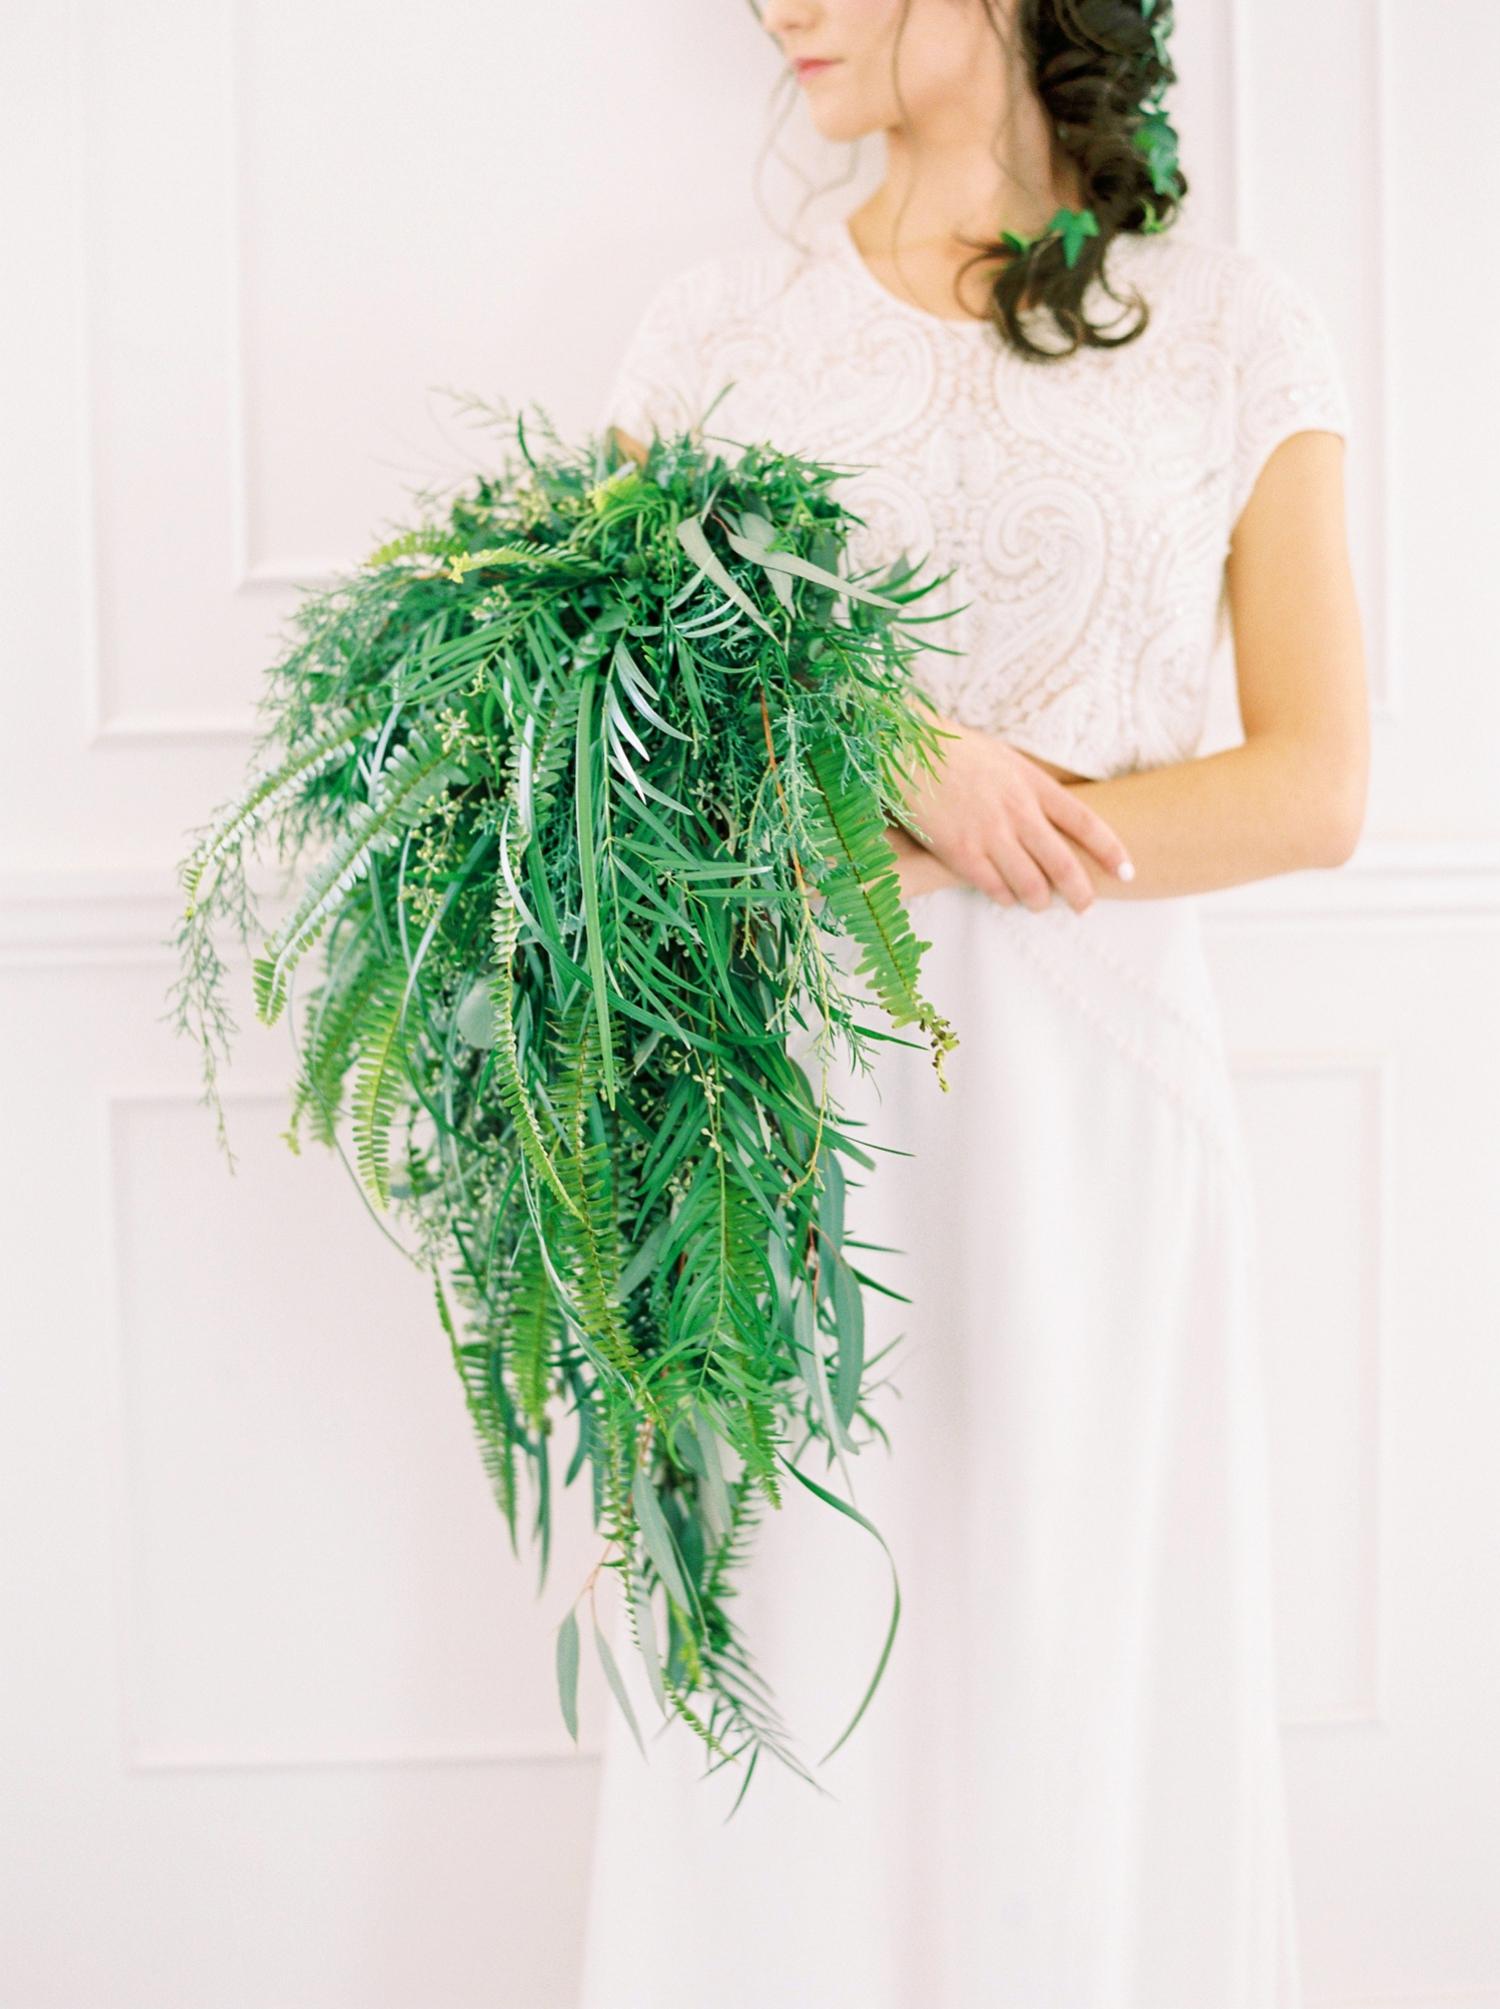 Calgary wedding photographers | fine art film | Justine Milton Photography | wedding details | editorial | wedding inspiration | wedding dress